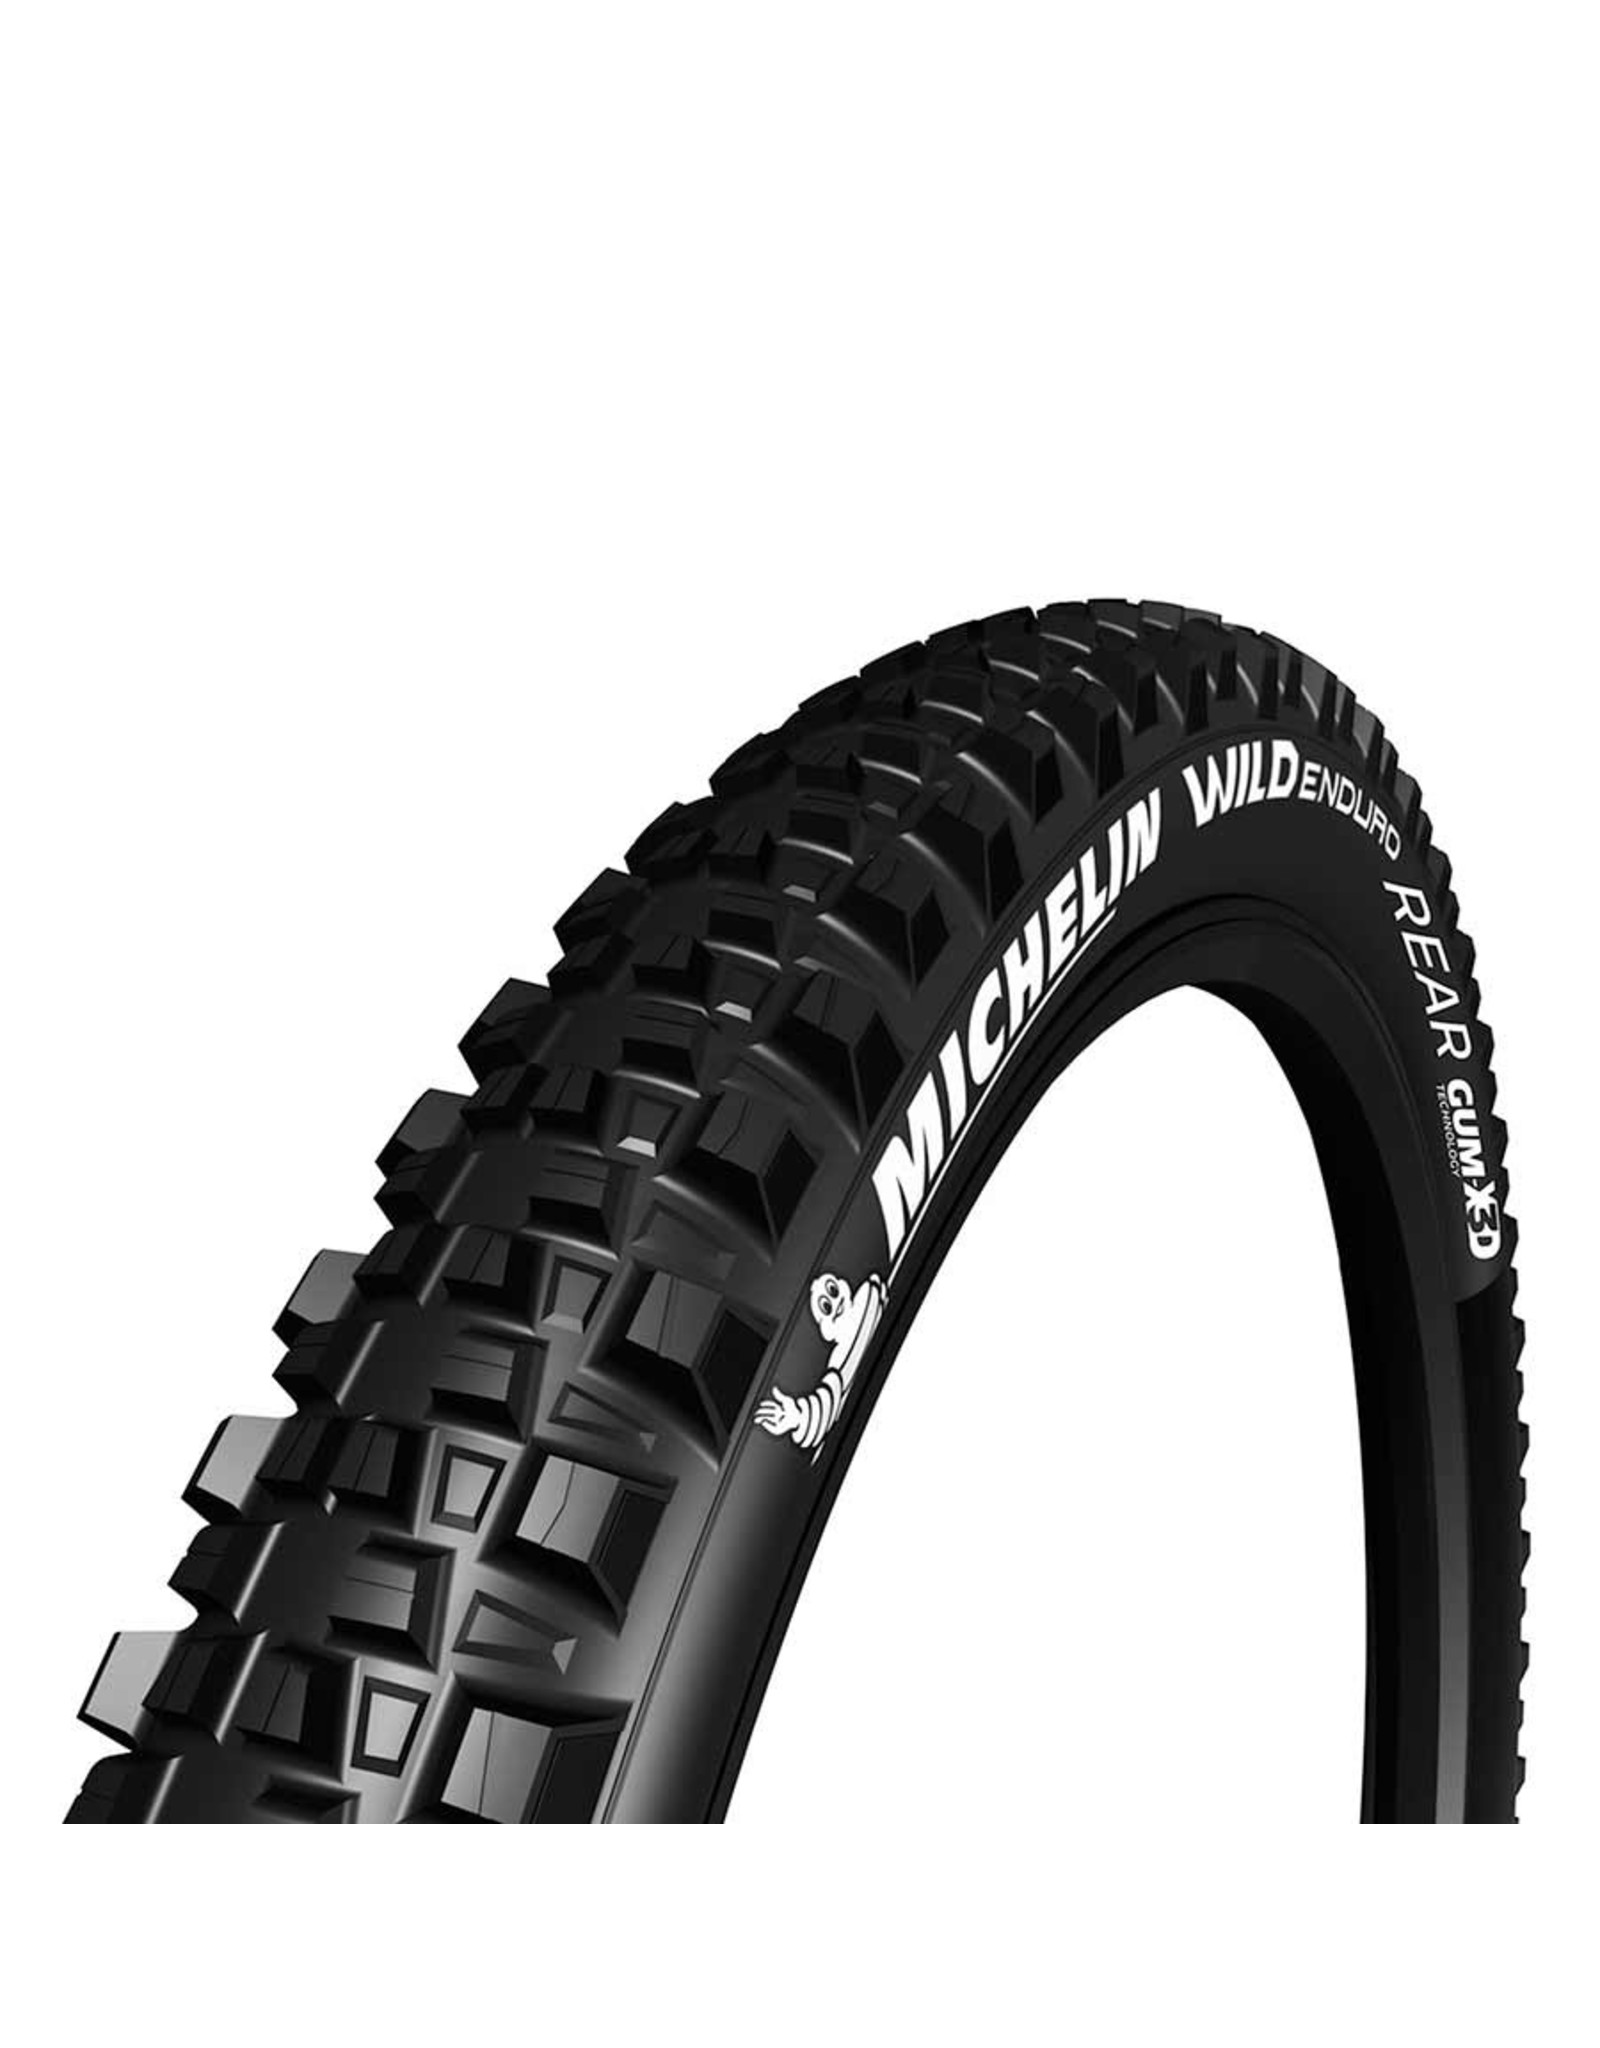 Michelin Michelin, Wild Enduro Rear, Tire, 27.5''x2.80, Folding, Tubeless Ready, GUM-X, GravityShield, 3x33TPI, Black